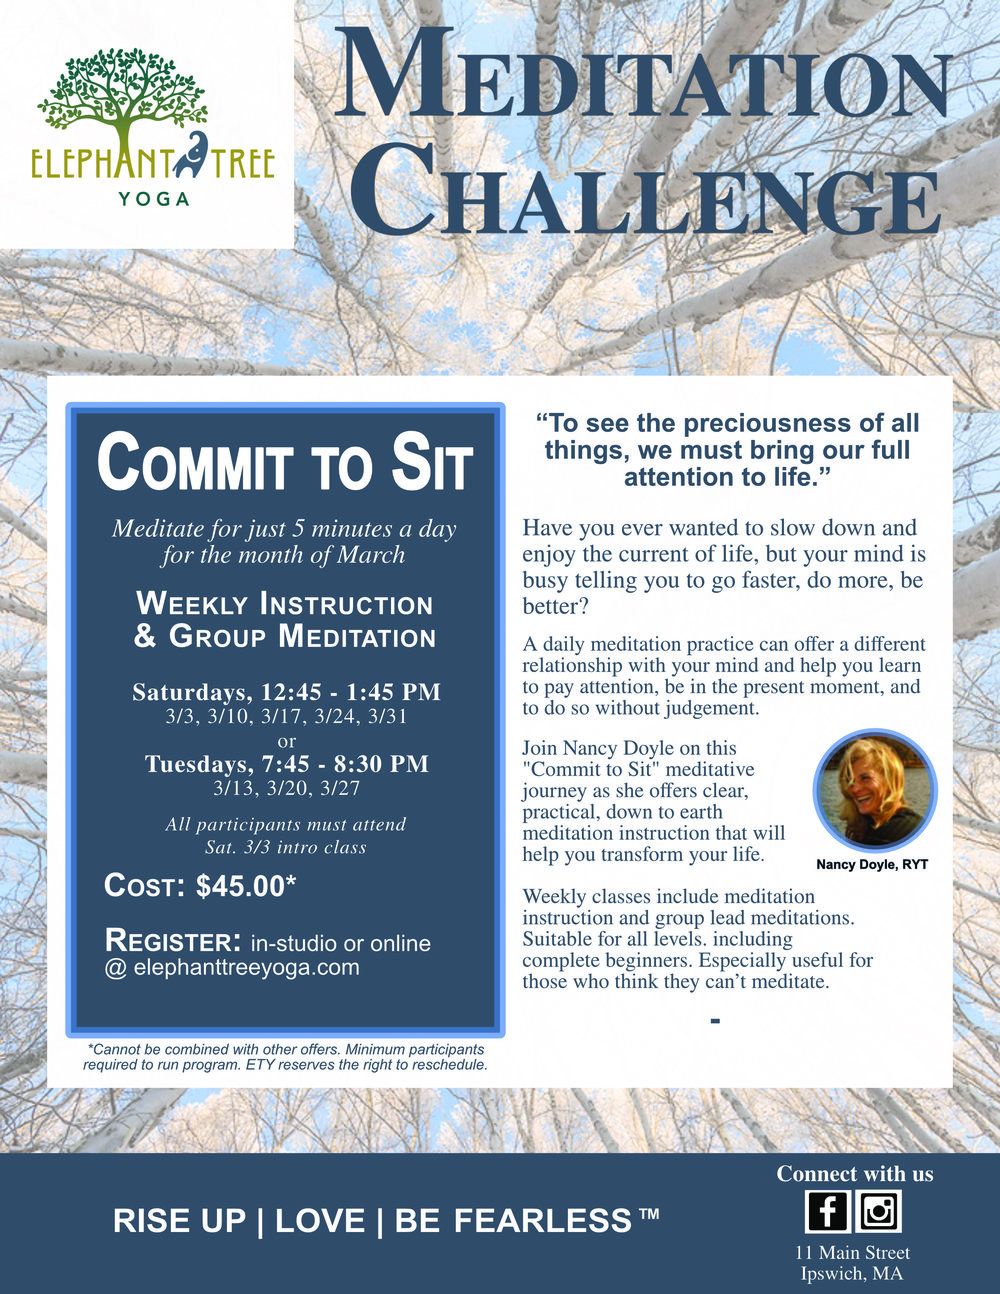 Meditation Challenge FINAL - 020818.jpg